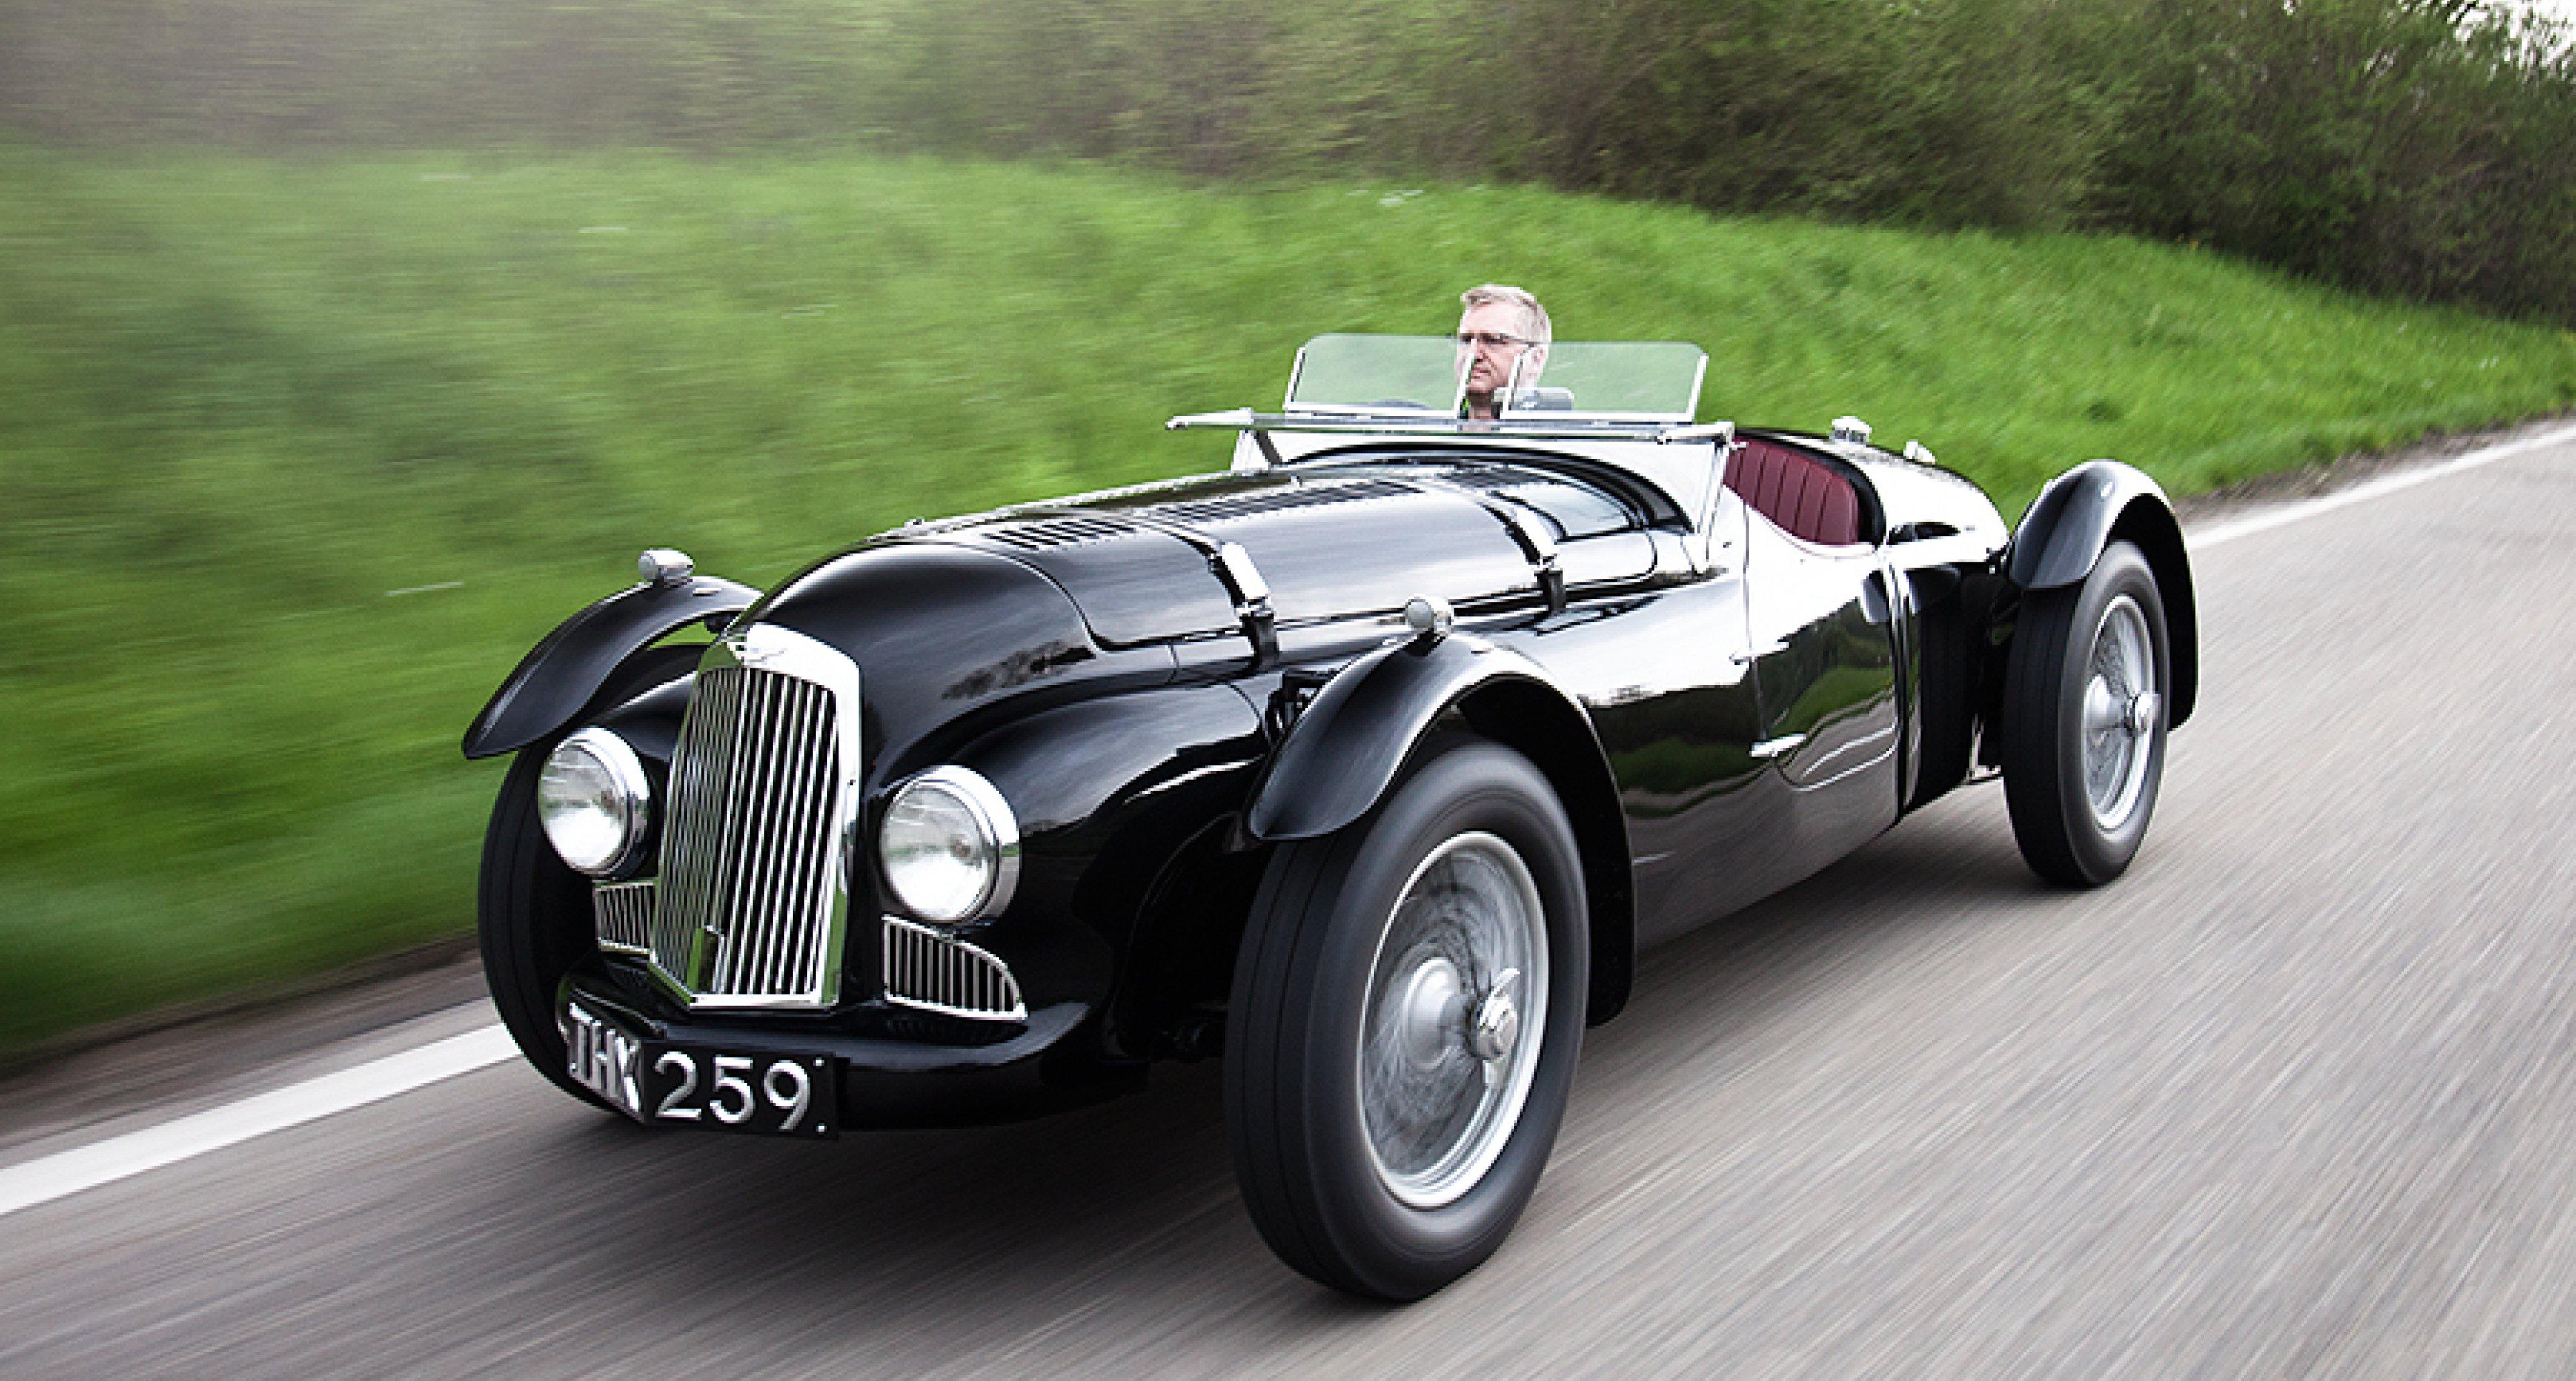 Aston Martin Spa Replica The First Post War Aston Classic